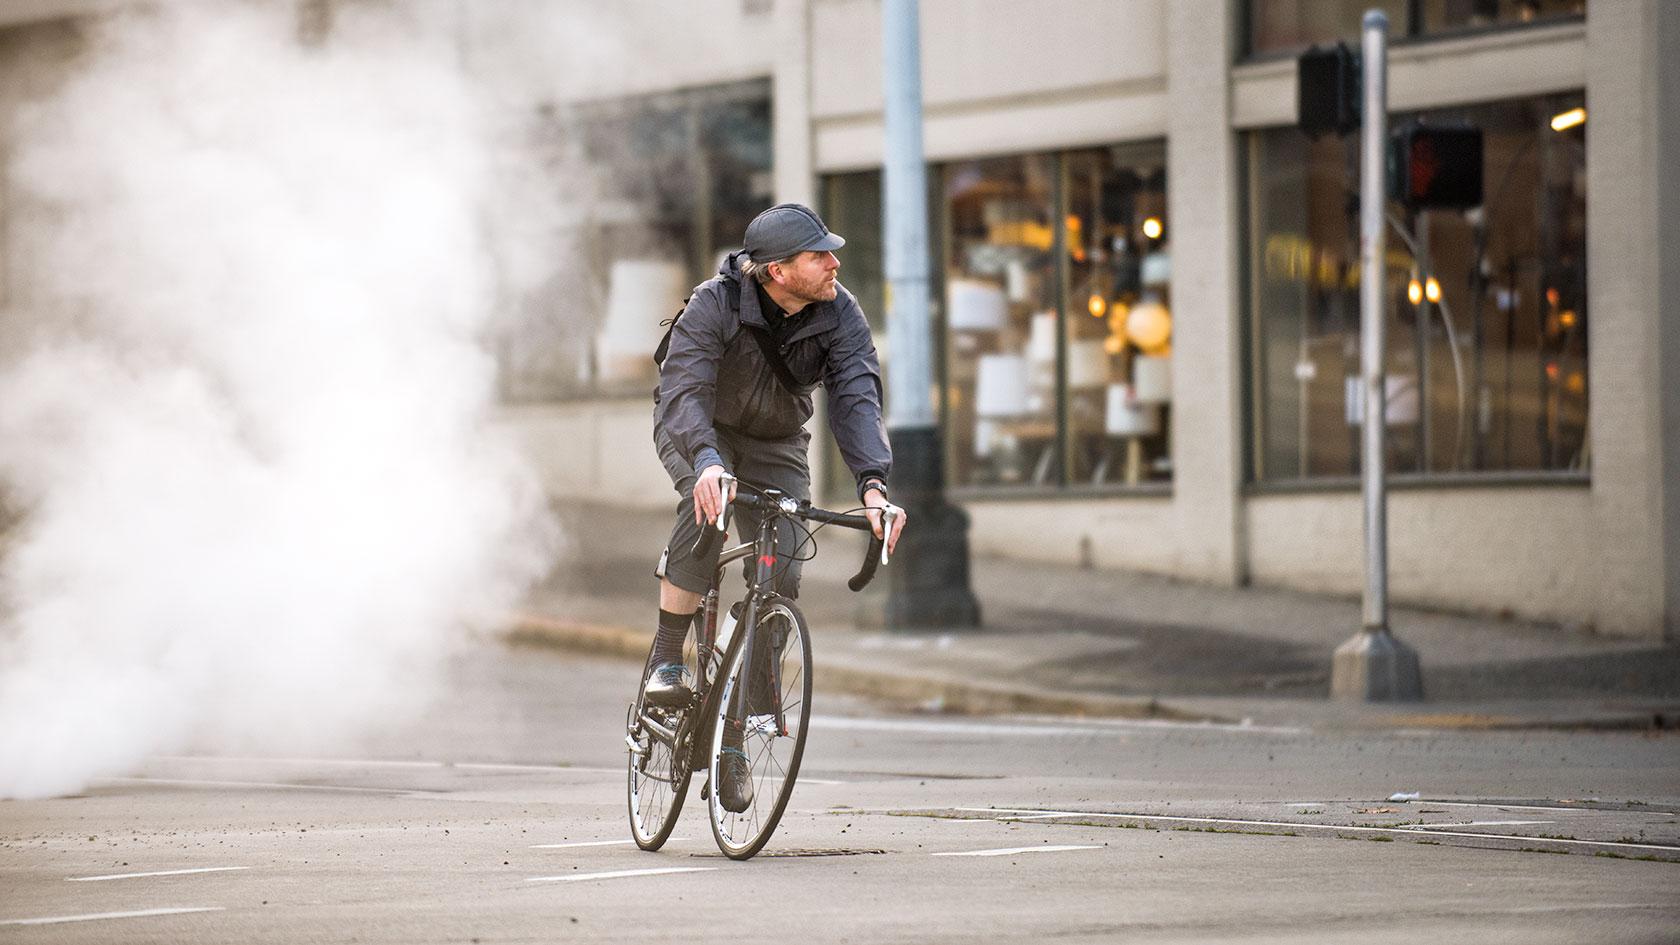 austin-trigg-seattle-bicycle-company-lifestyle-street-ride.jpg